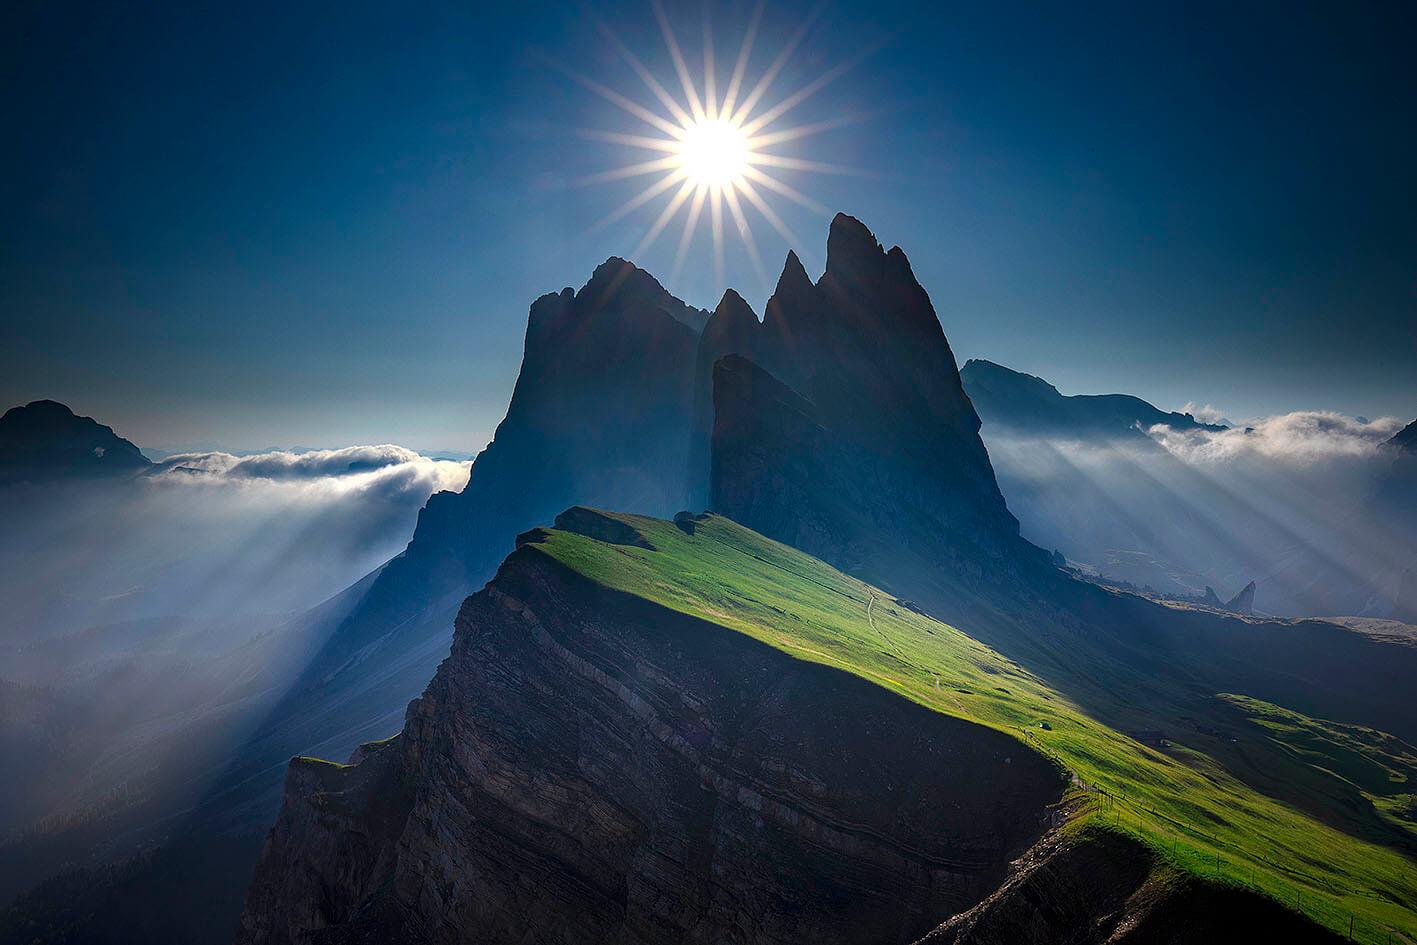 Entrevista al fotógrafo Miguel Angel Morenatti para Leofoto en Dolomites